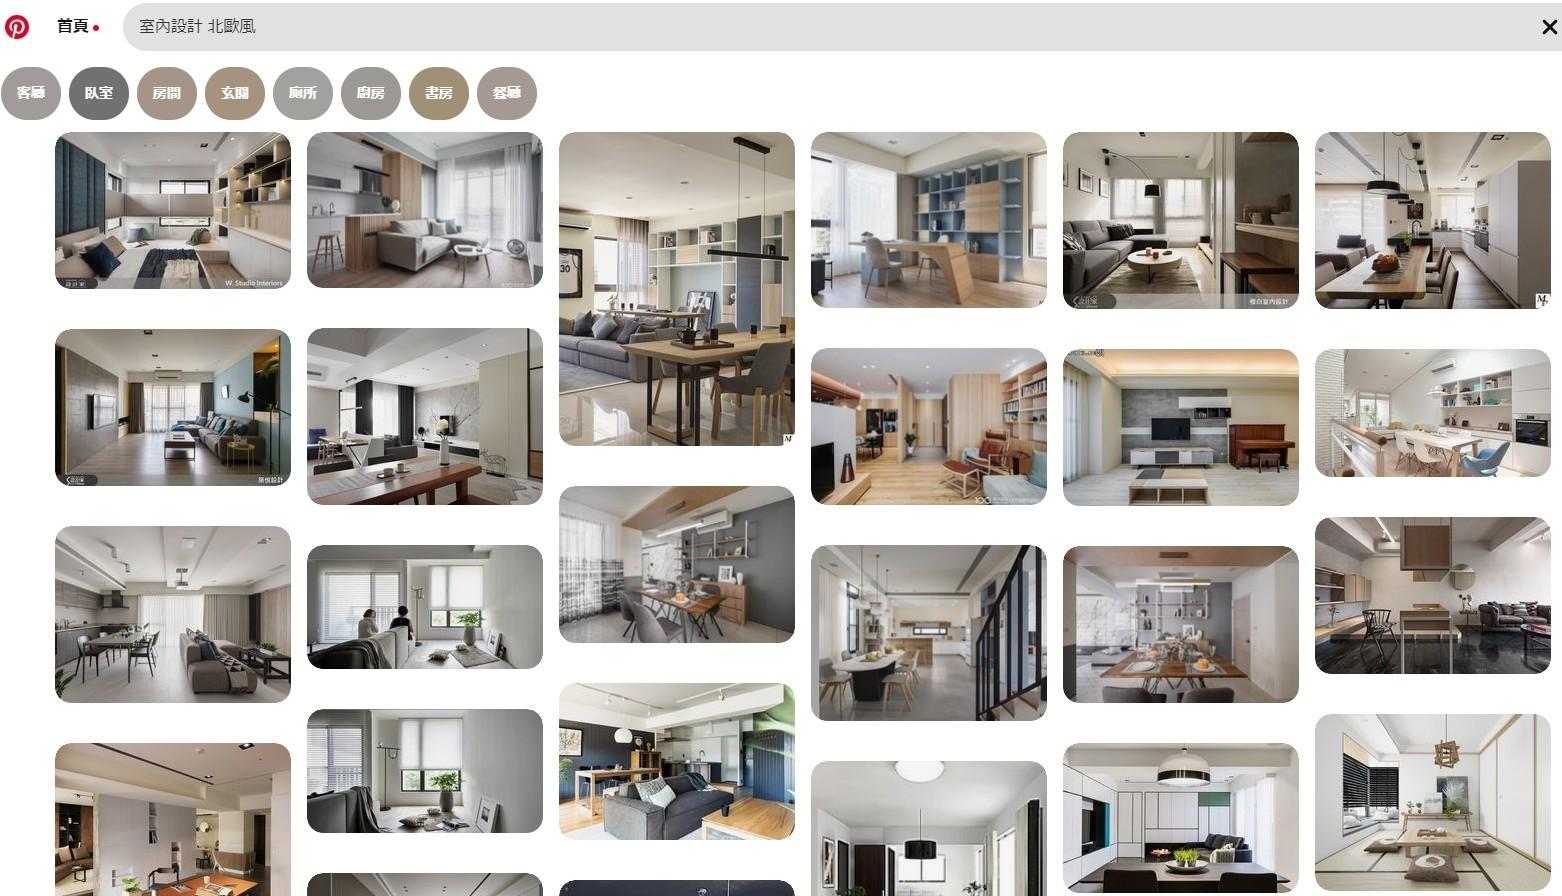 04-pinterest參考範例圖集|小福砌室內設計